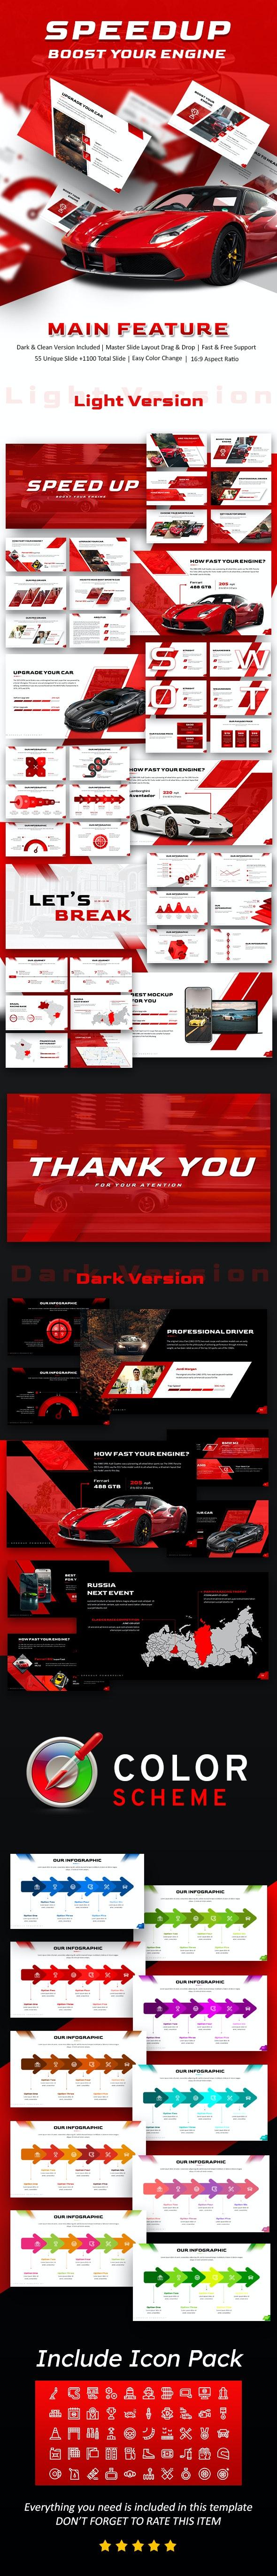 SpeedUp Automotive Presentation Template - PowerPoint Templates Presentation Templates